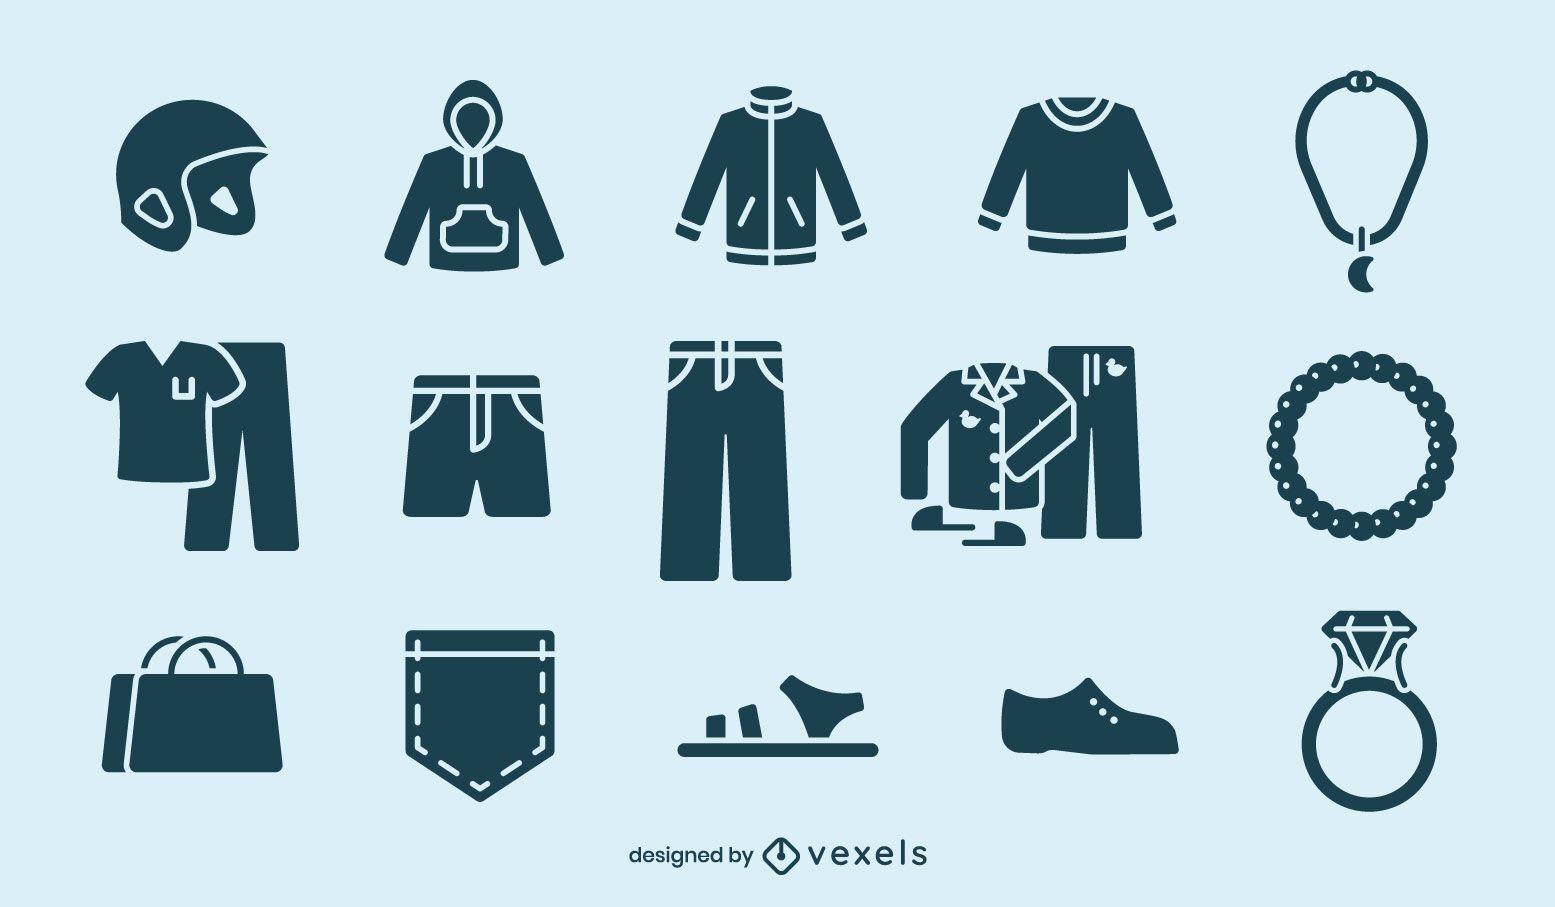 Clothing cut-out element set